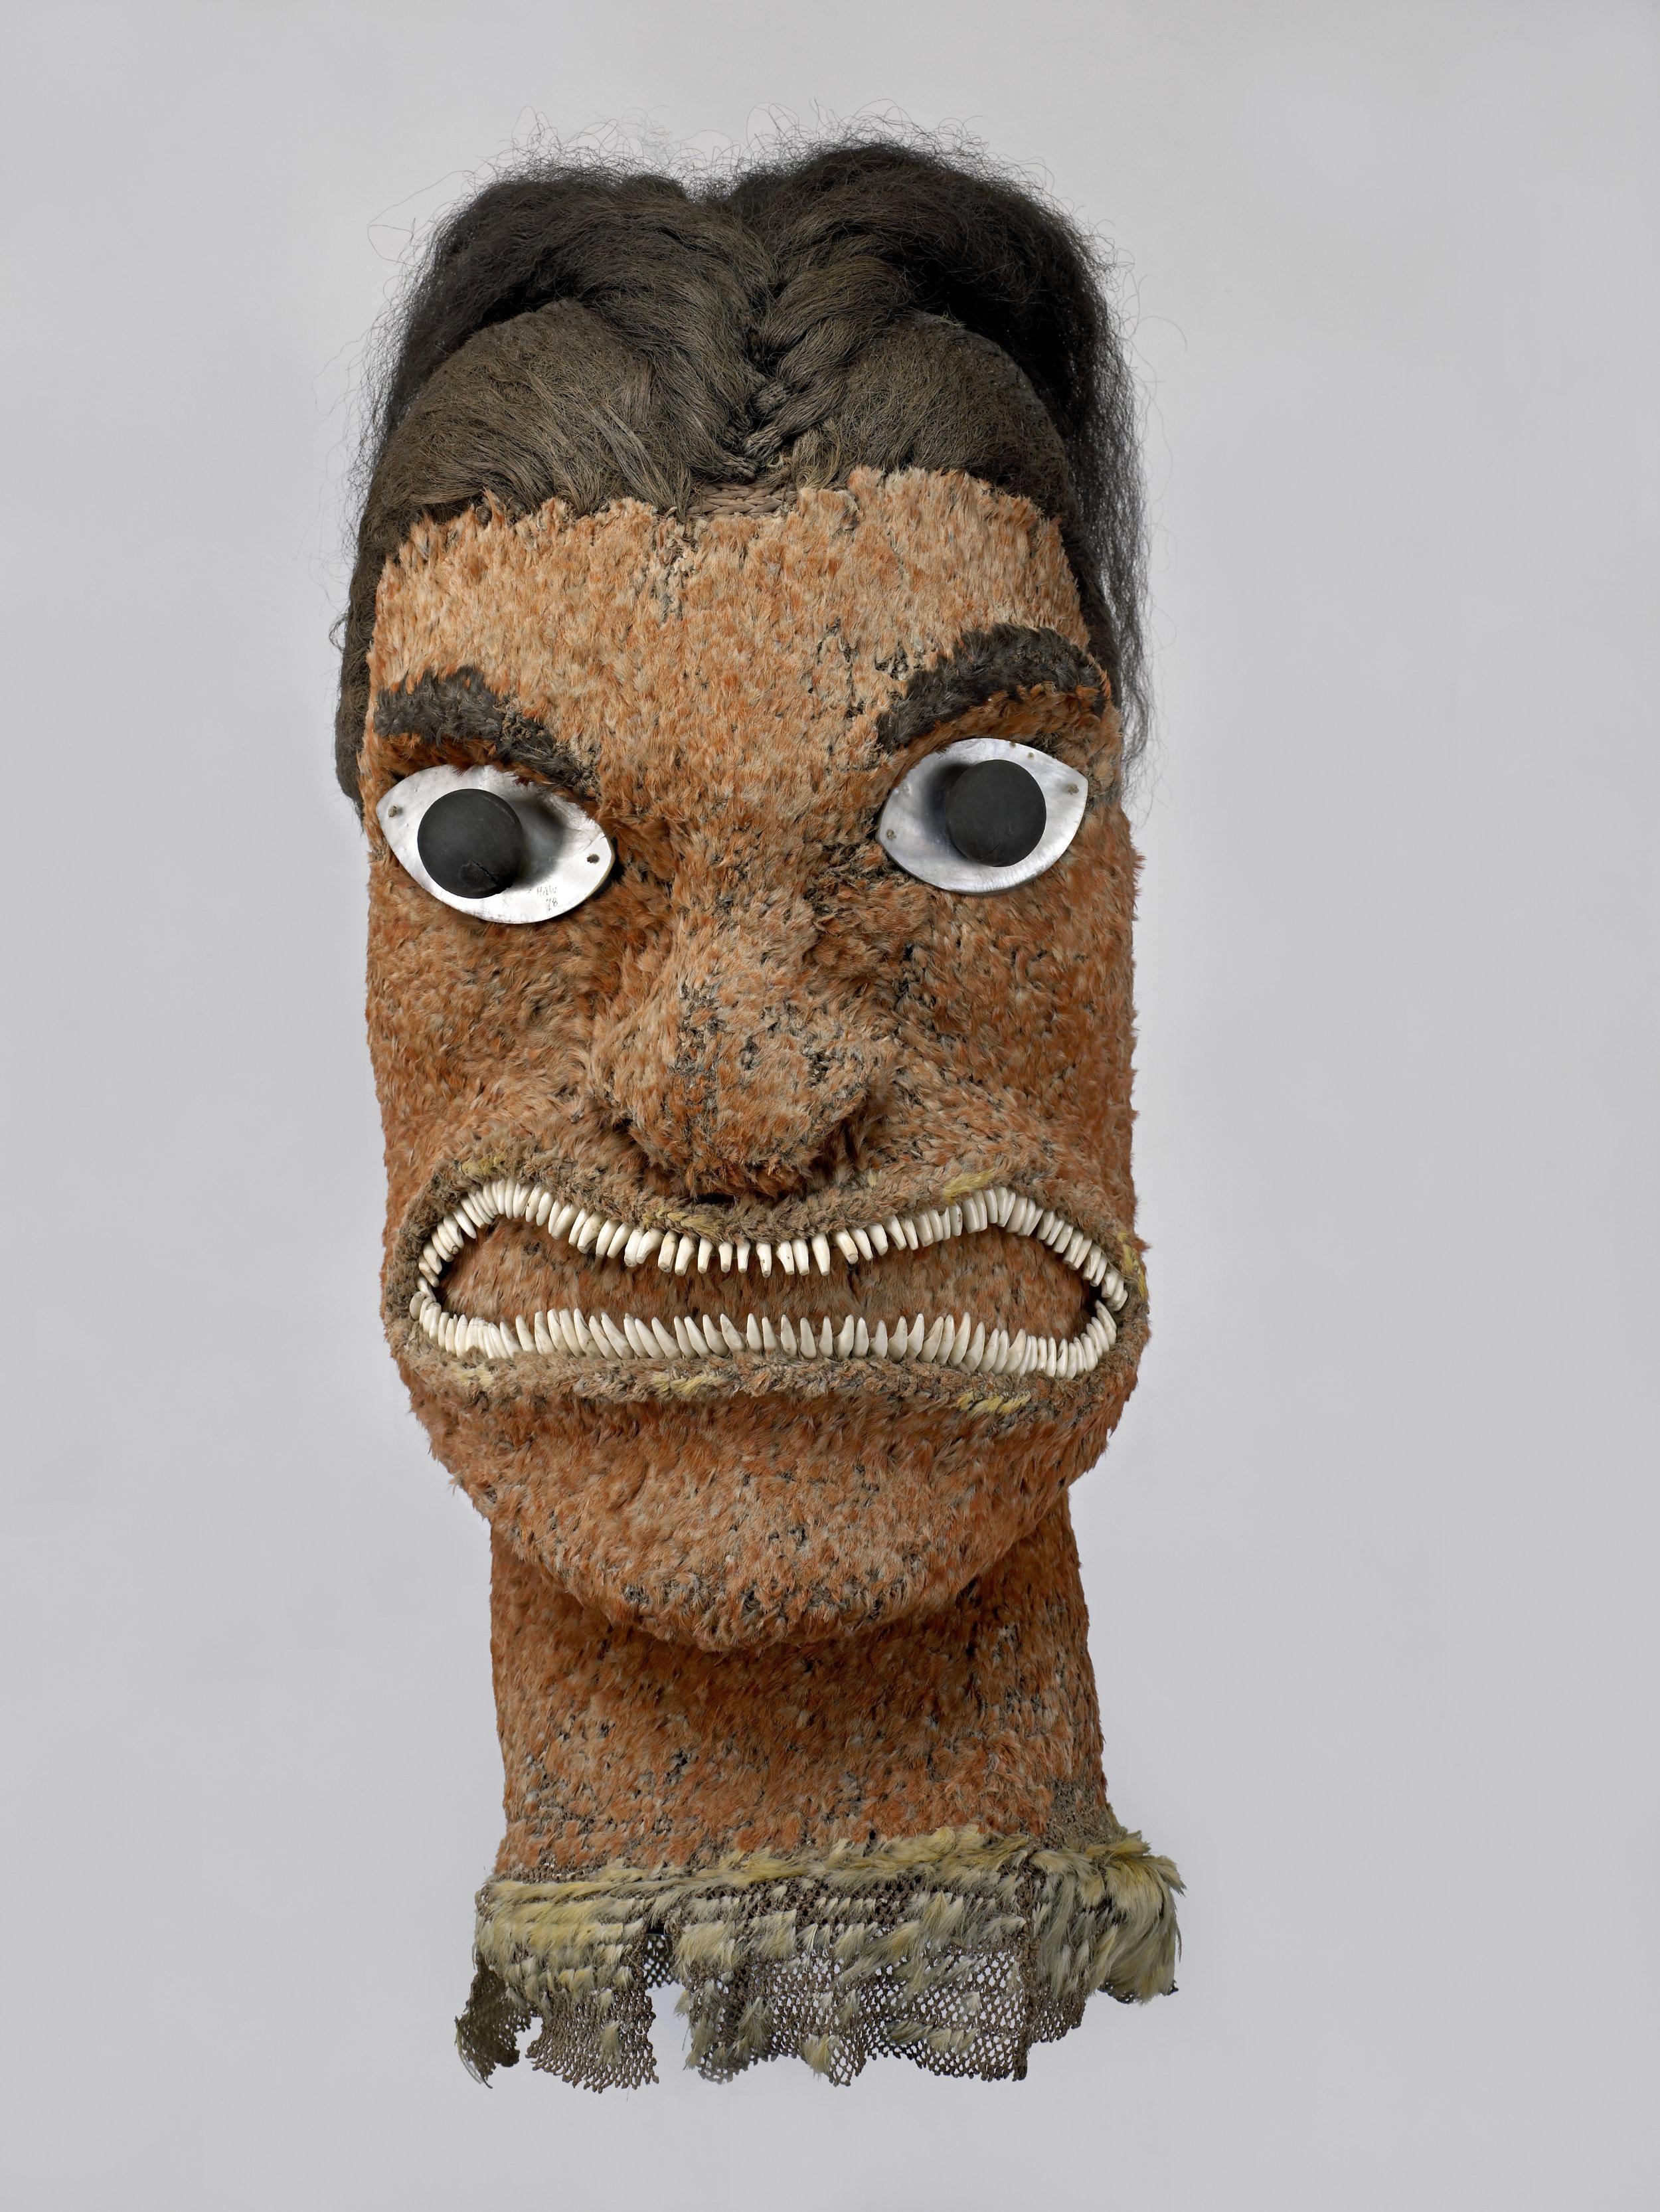 Feather god image (akua hulu manu), Late 18th century, Hawaiian Islands. Fibre, feathers, human hair, pearl shell, seed, dog teeth, 62 x 30 cm. (PHOTO: The Trustees of the British Museum)